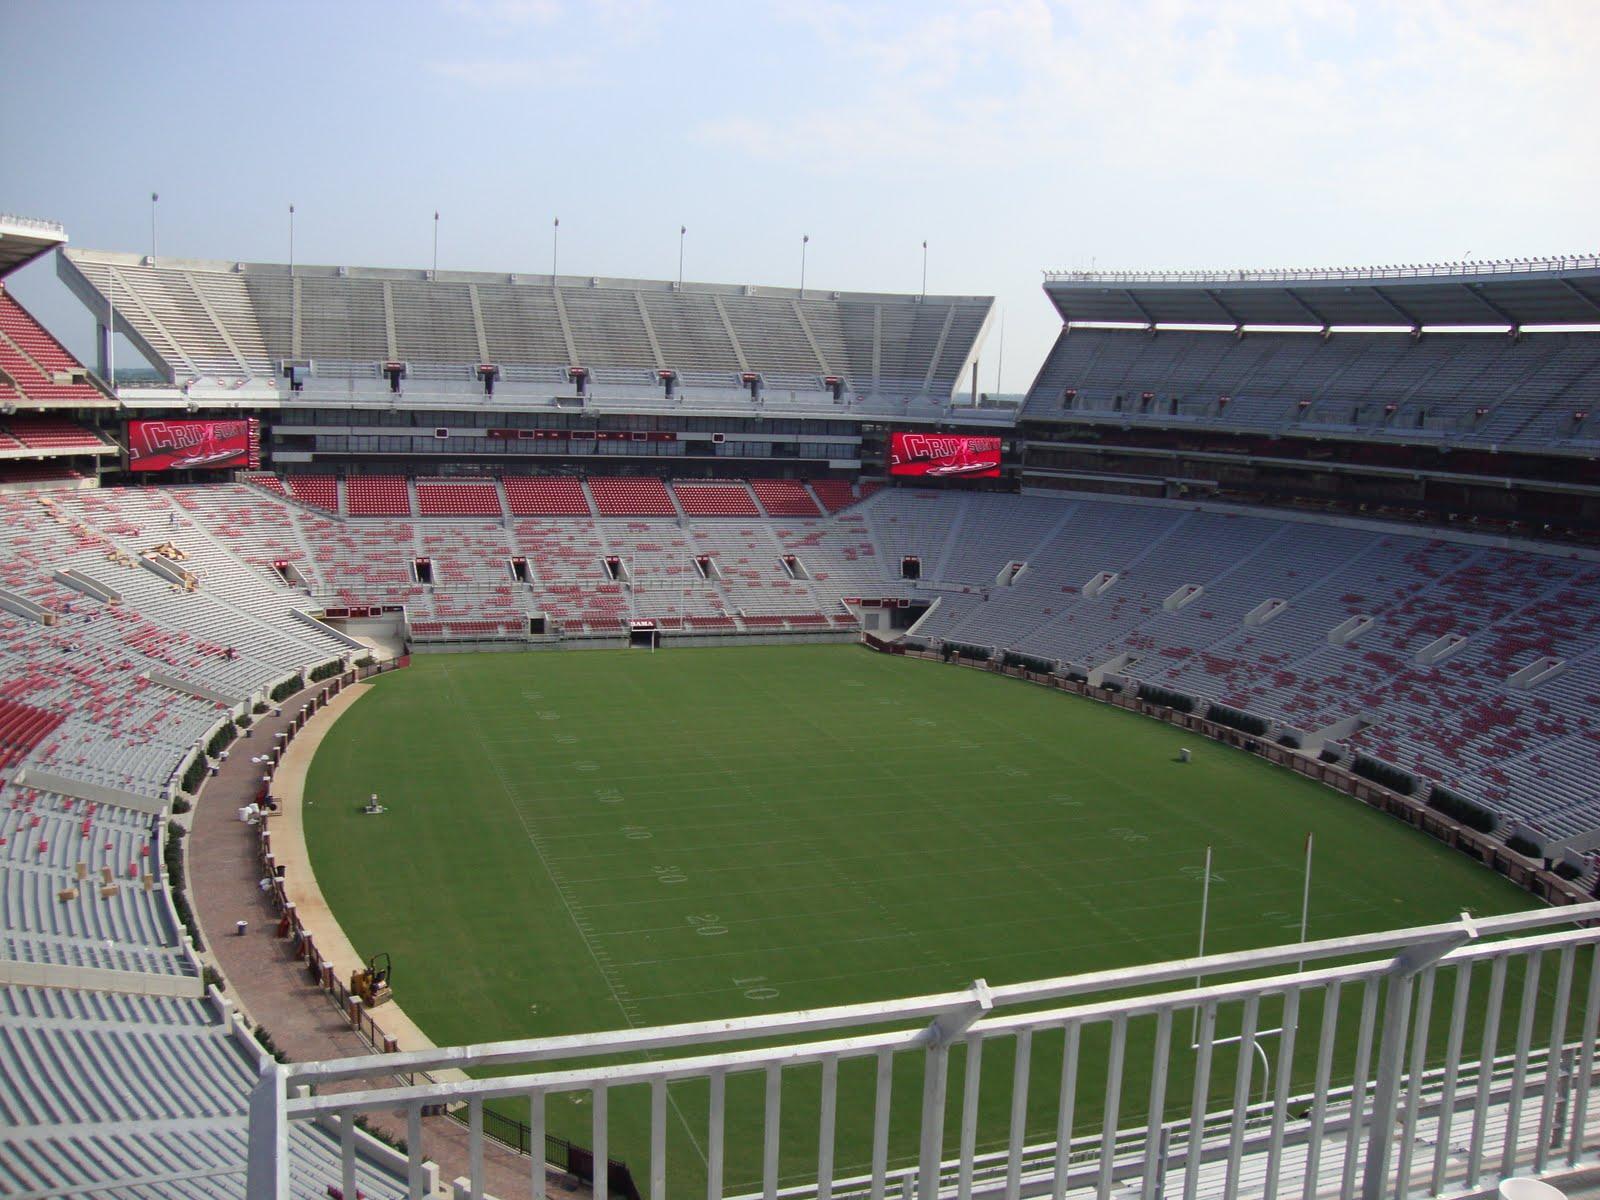 University of Alabama - Bryant Denny Stadium